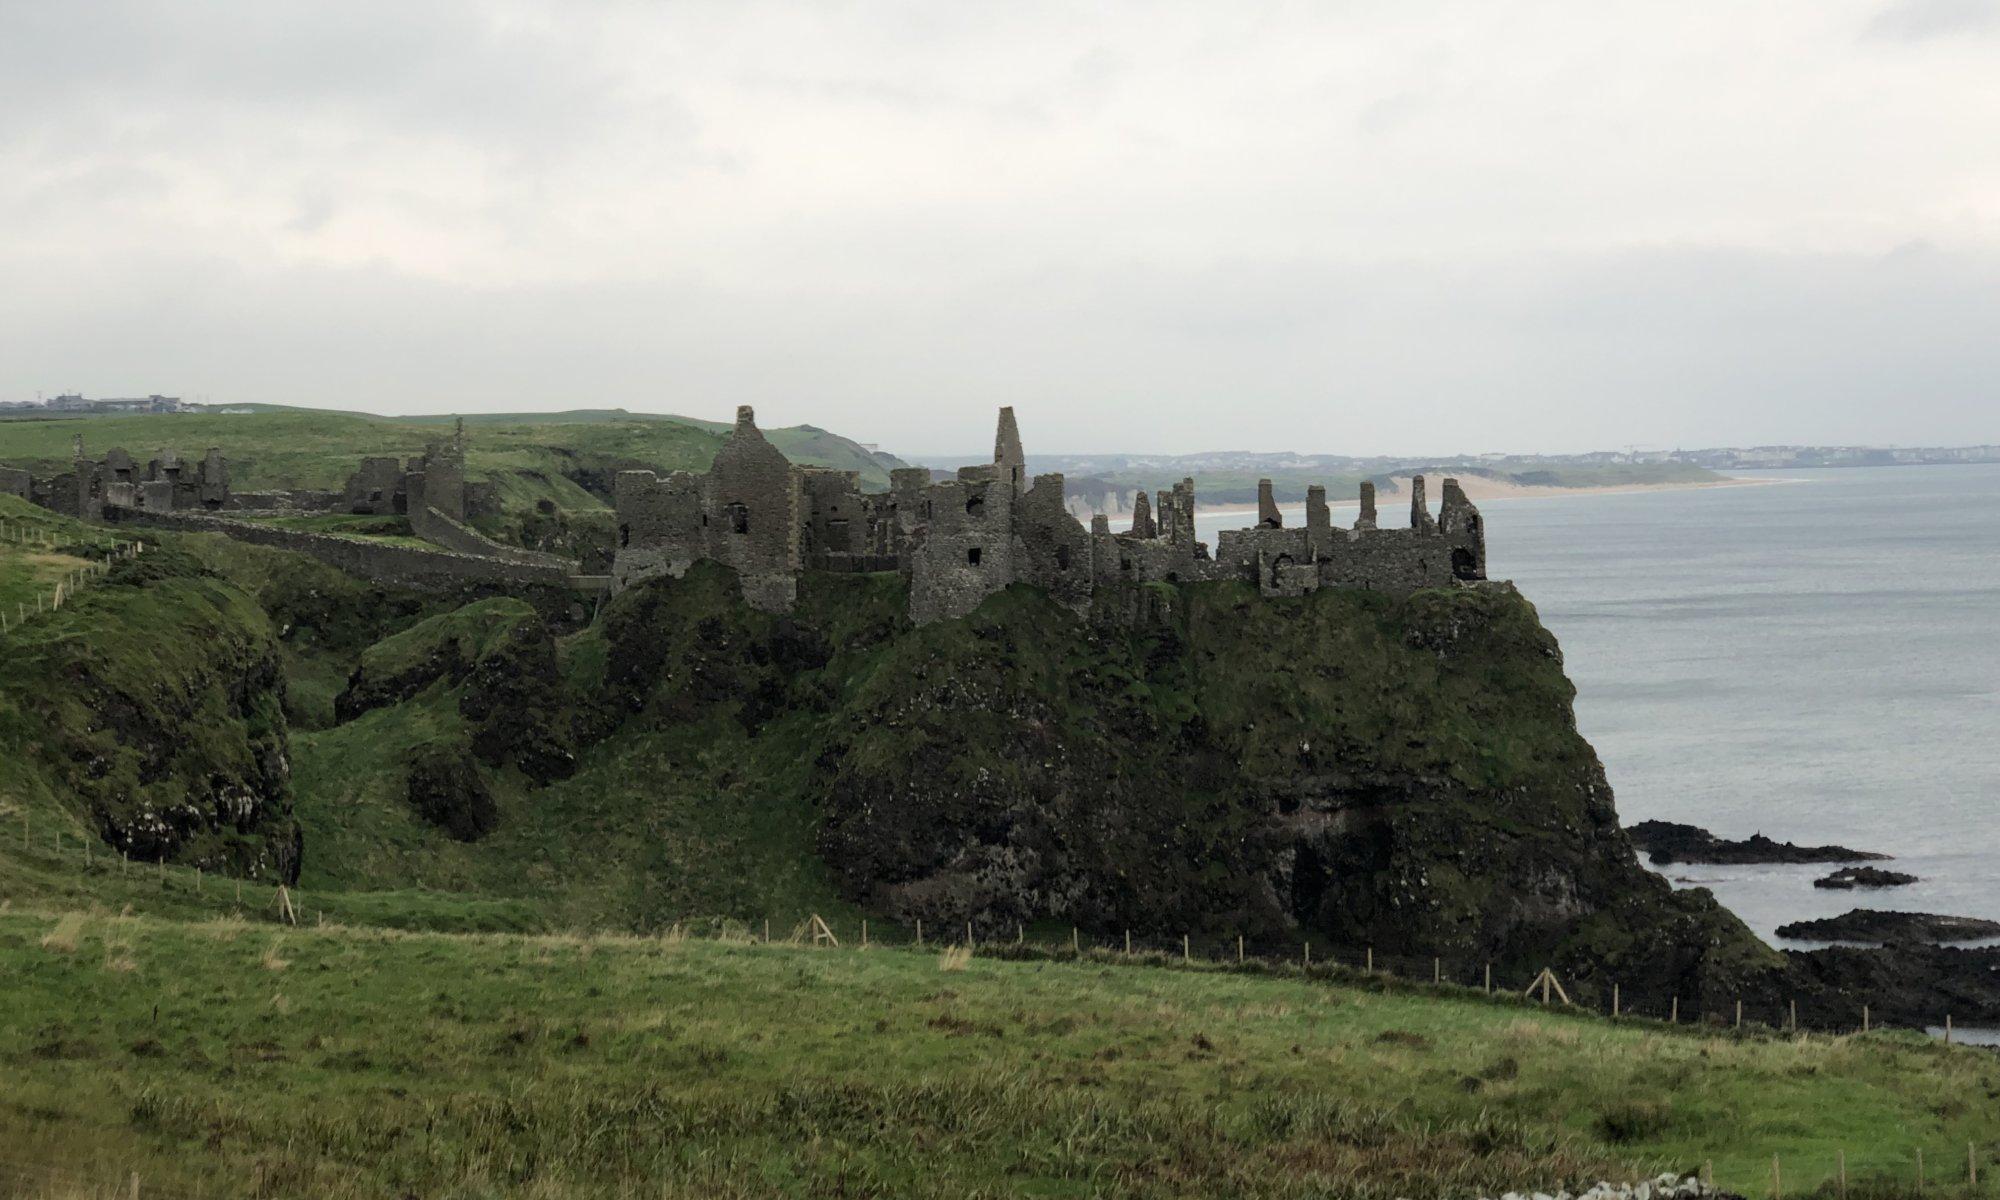 Dunluce castle, Bushmills, Northern Ireland